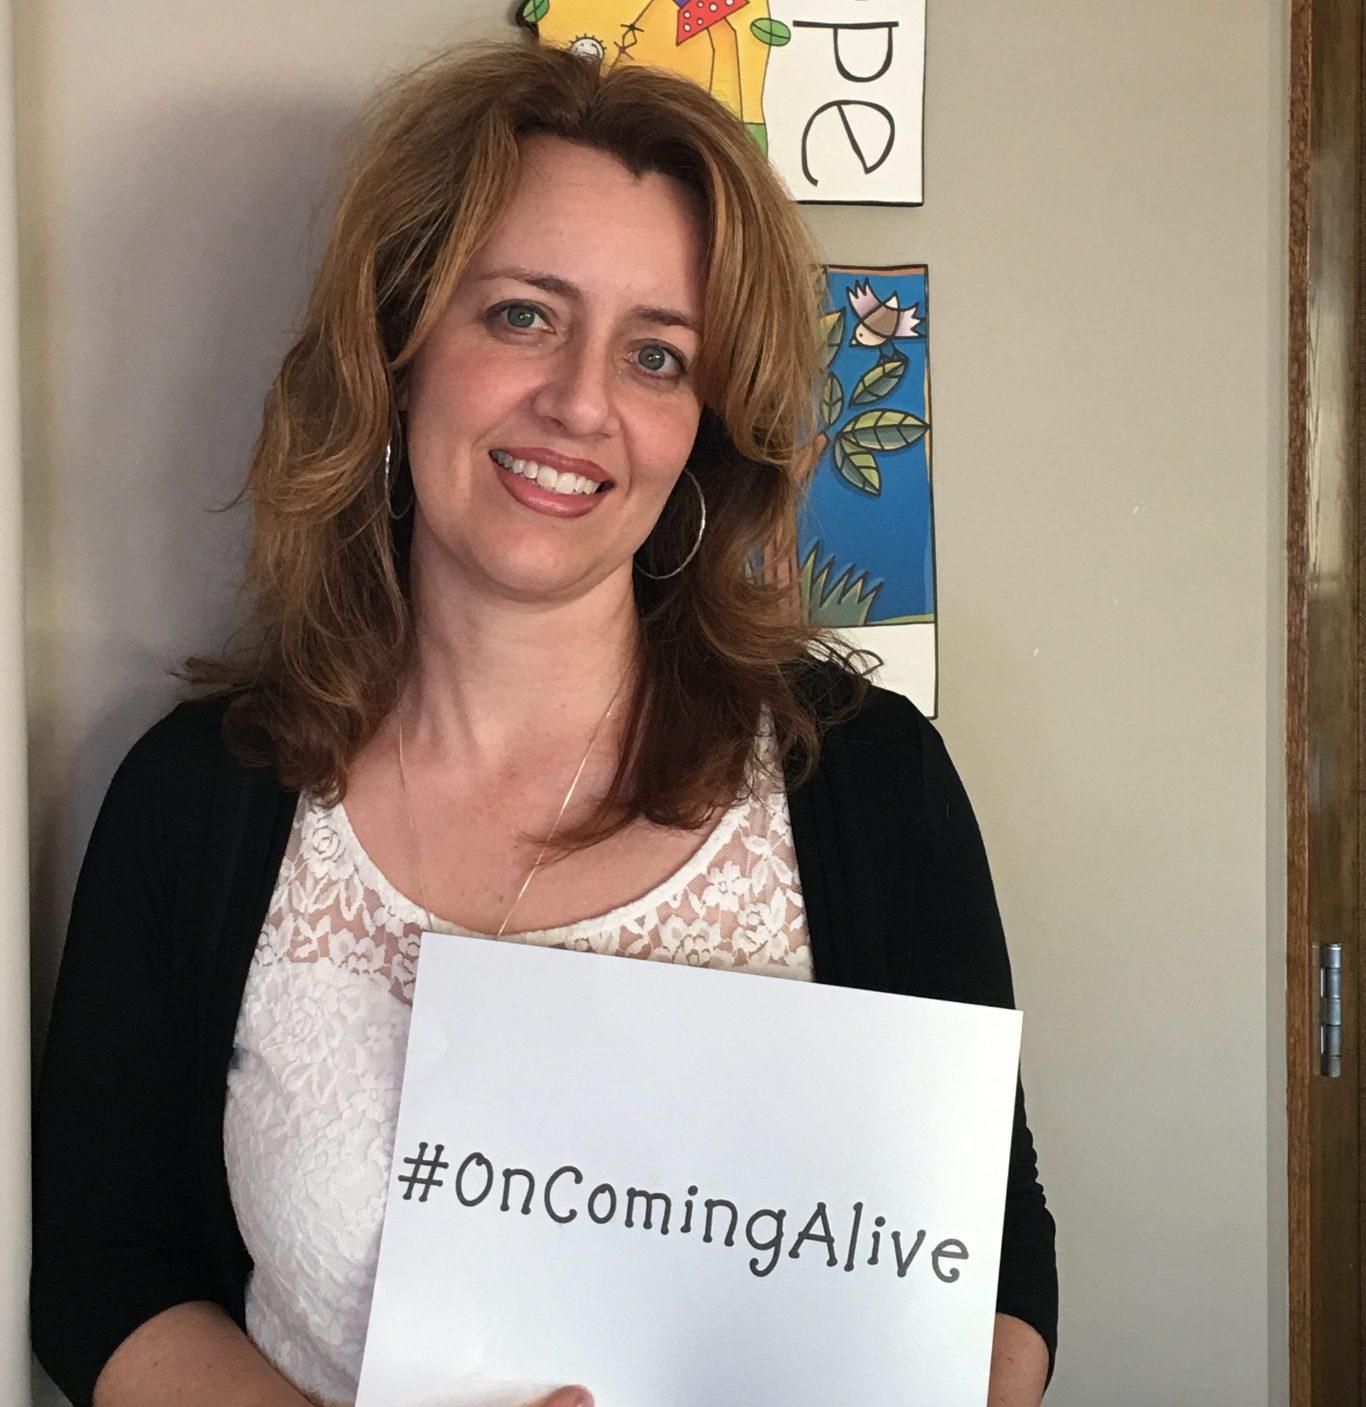 Sherri #OnComingAlive